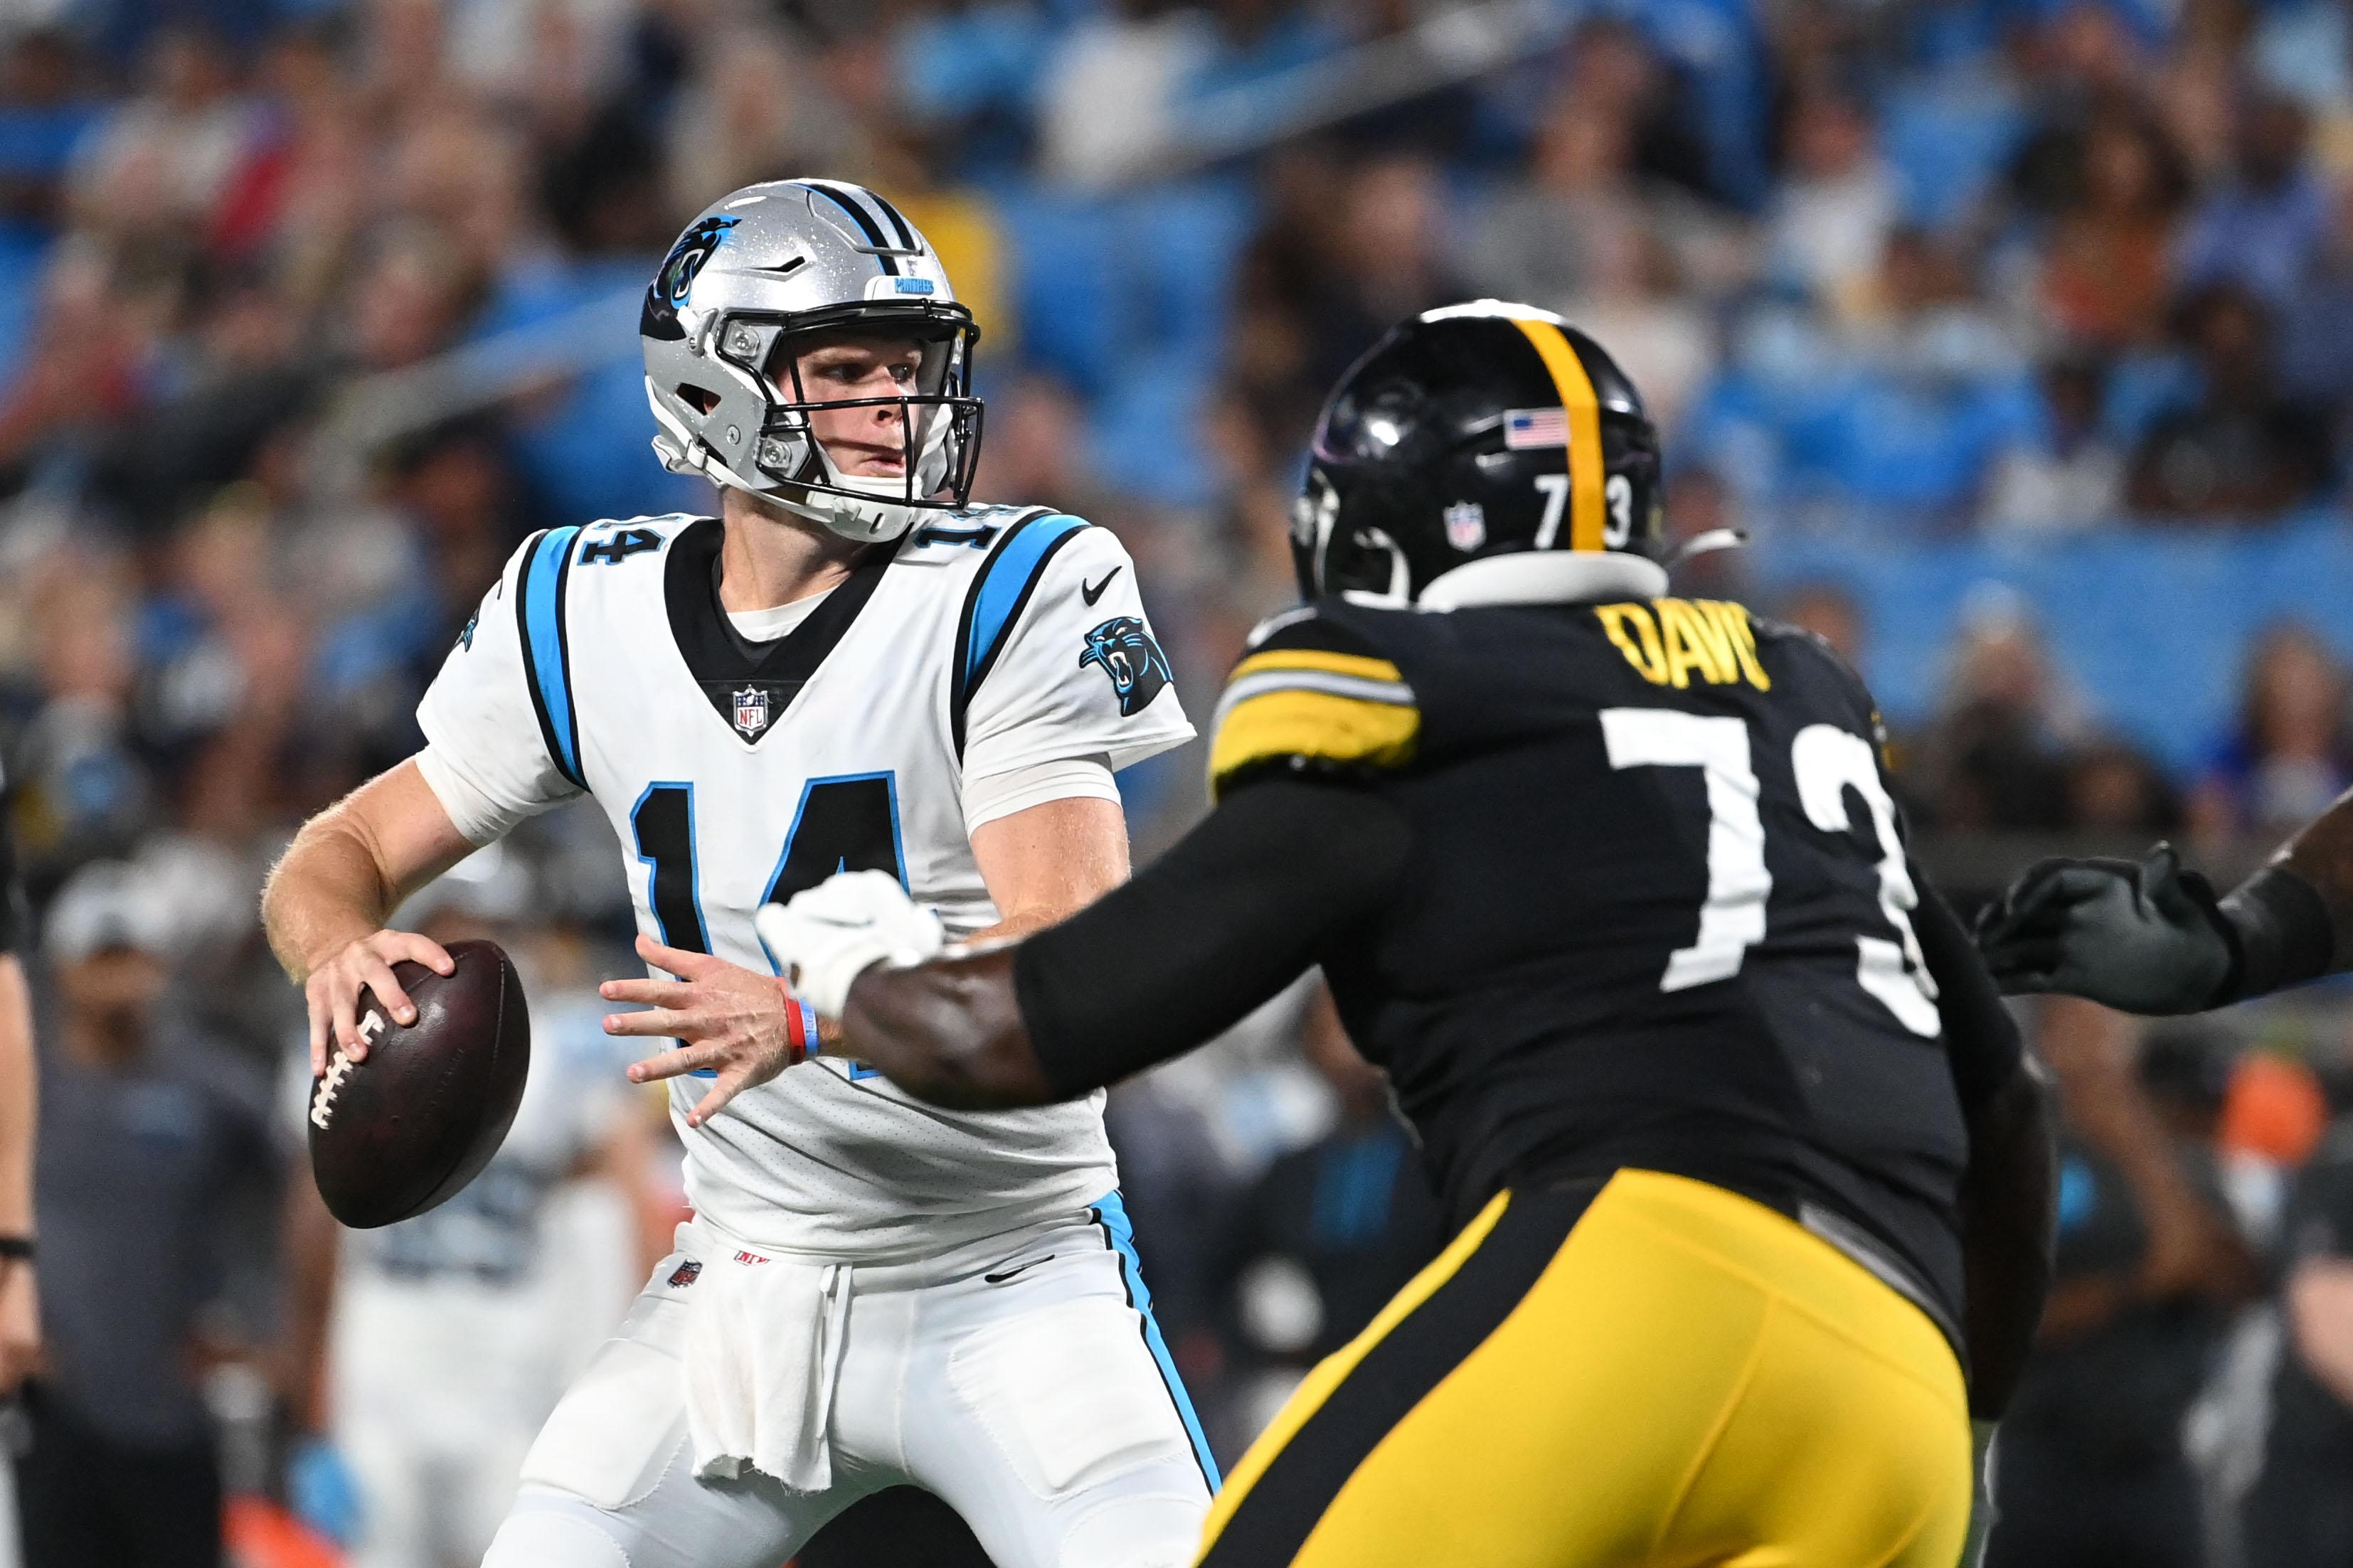 NFL: Pittsburgh Steelers at Carolina Panthers